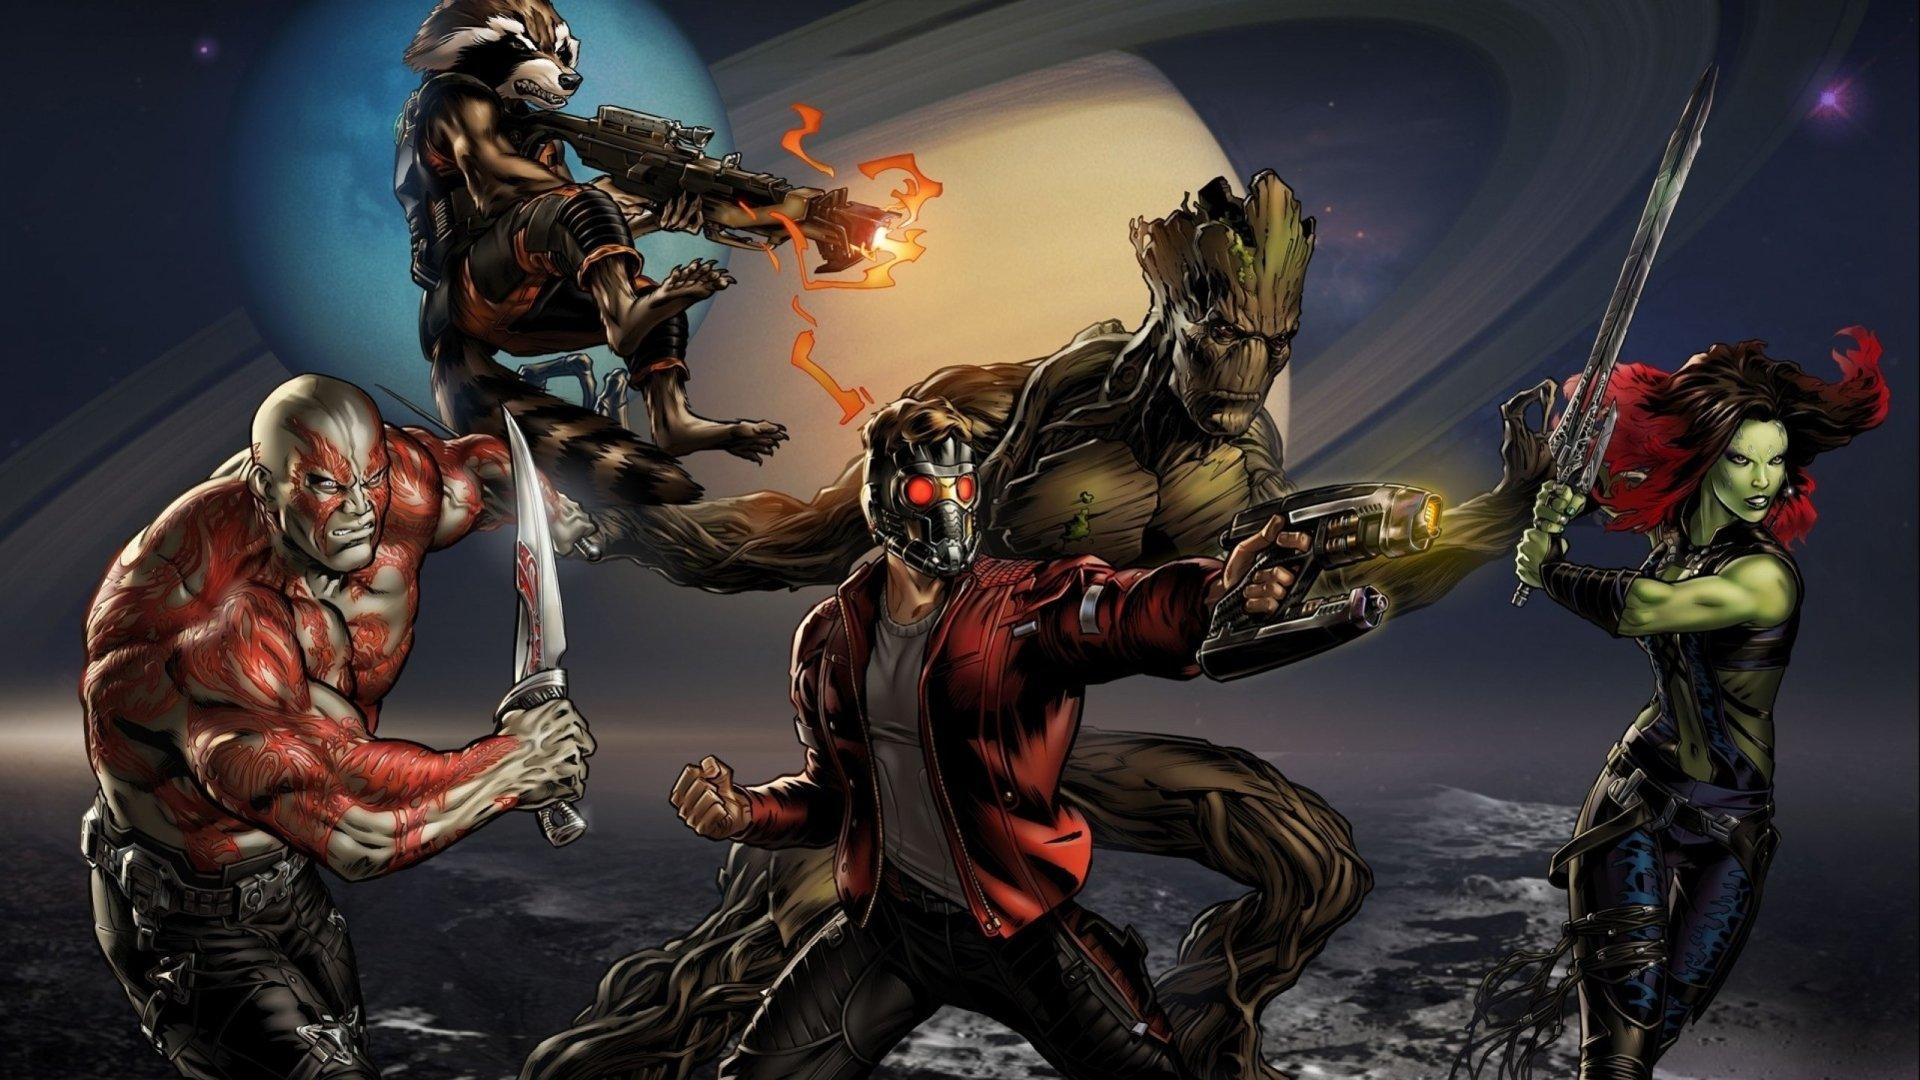 Comics - Guardians Of The Galaxy  Gamora Drax The Destroyer Comics Galaxy Marvel Comics Star Lord Comic Rocket Raccoon Groot Wallpaper